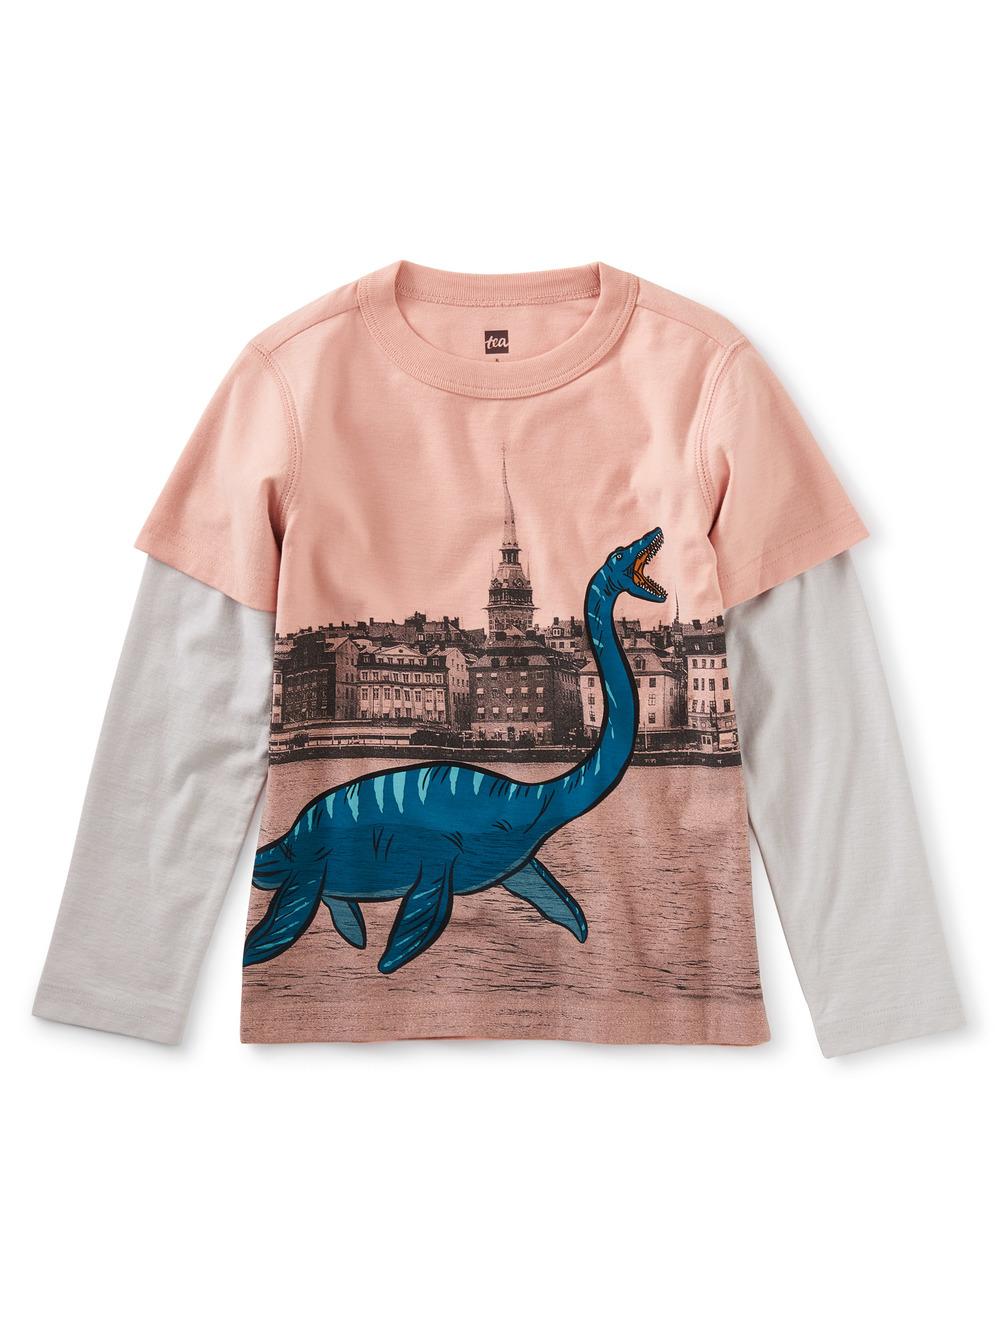 Stockholm Dinosaur Graphic Tee